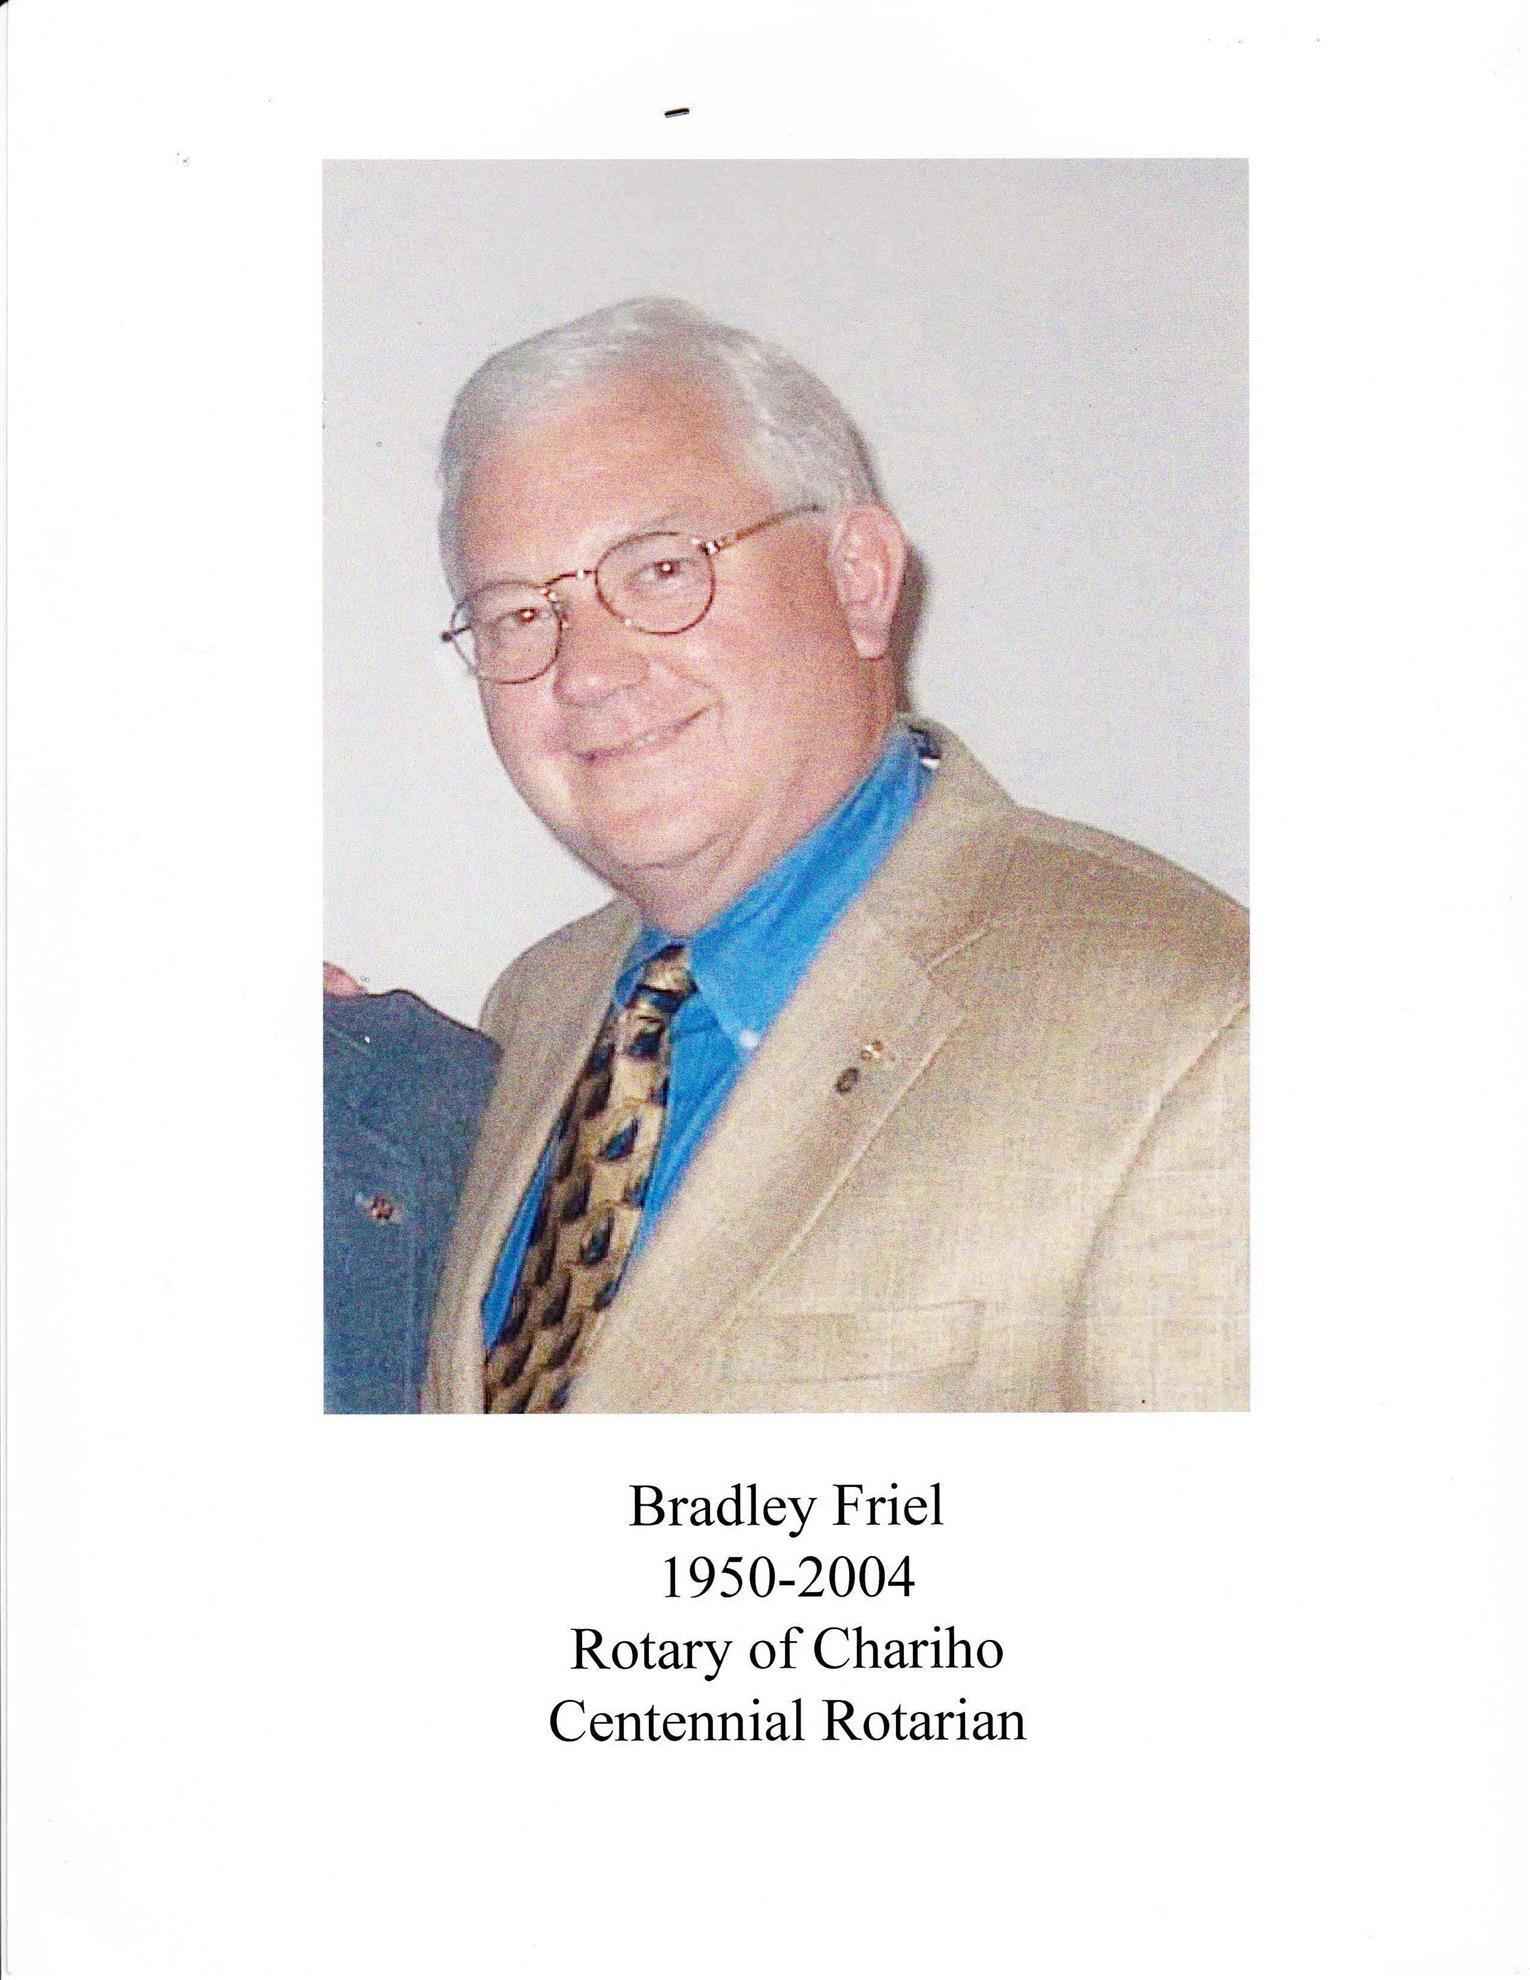 Brad Friel